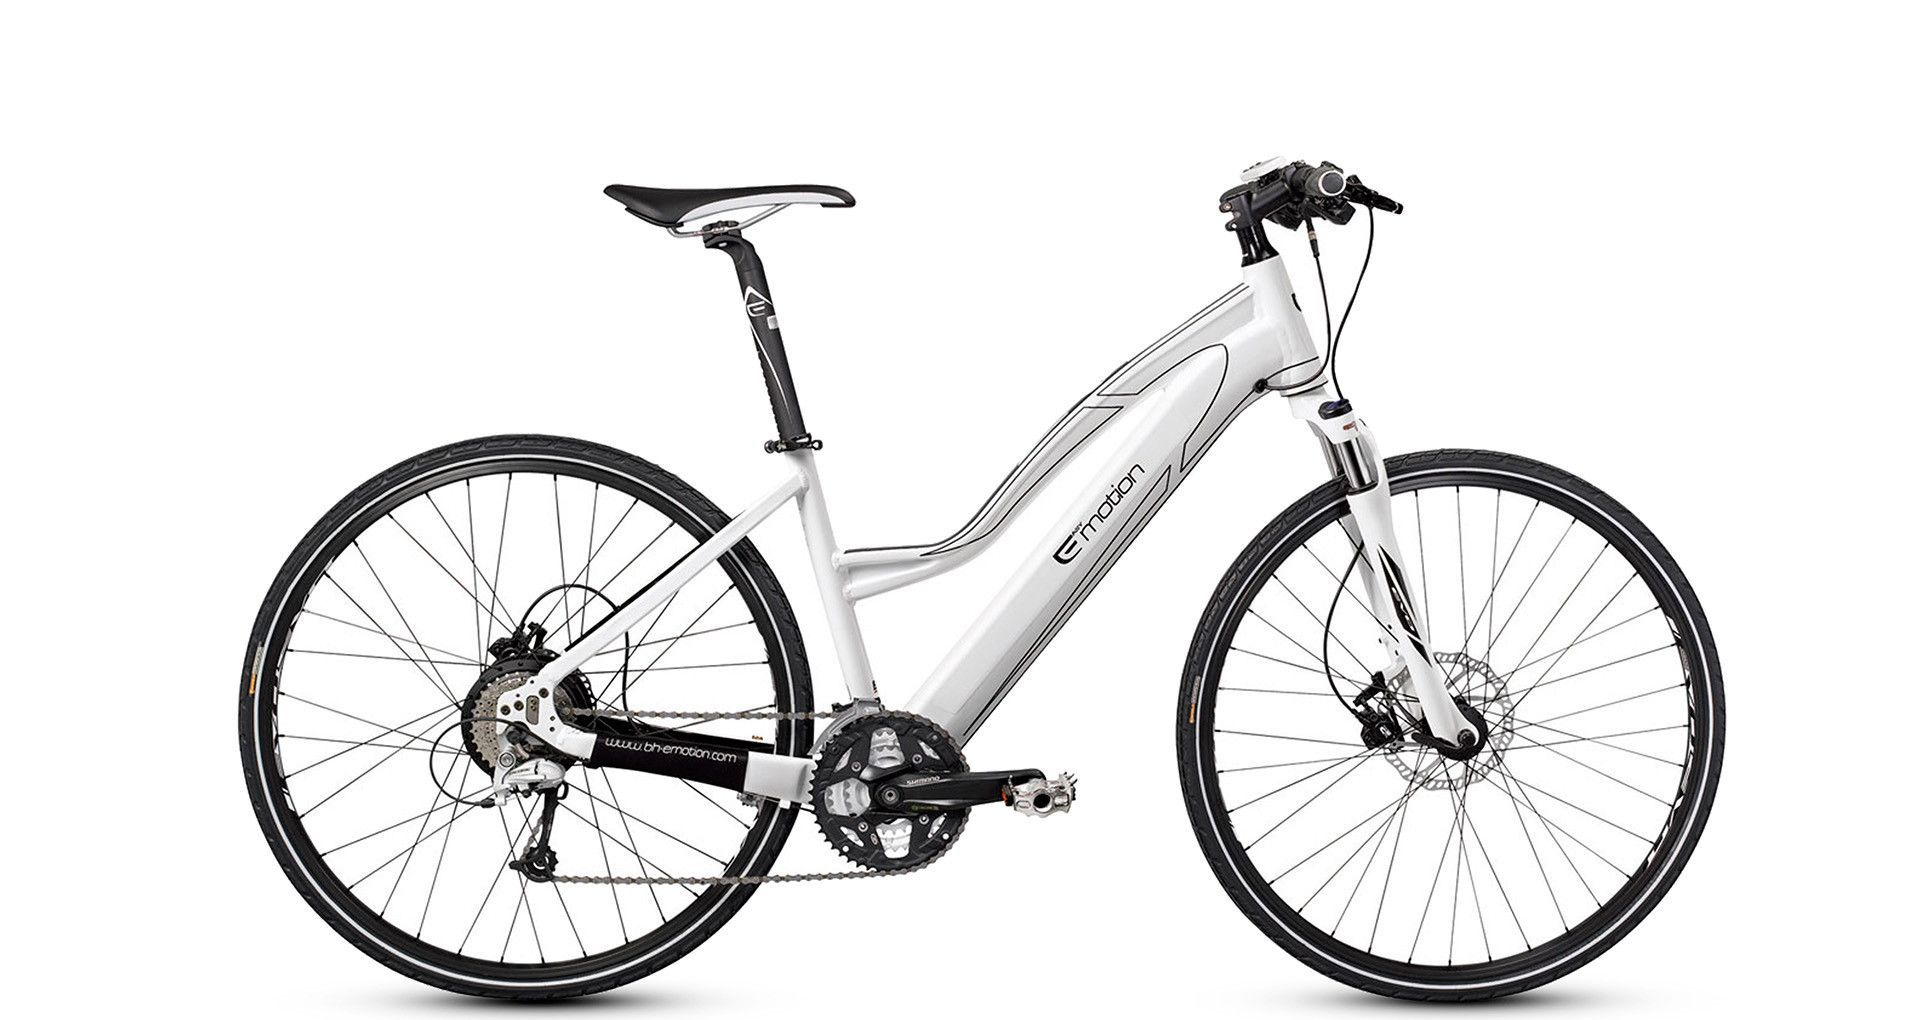 Bh Easy Motion Evo Jet 350w E Bike The Electric Spokes Company Mountain Bikes For Sale Hybrid Bike Bikes For Sale